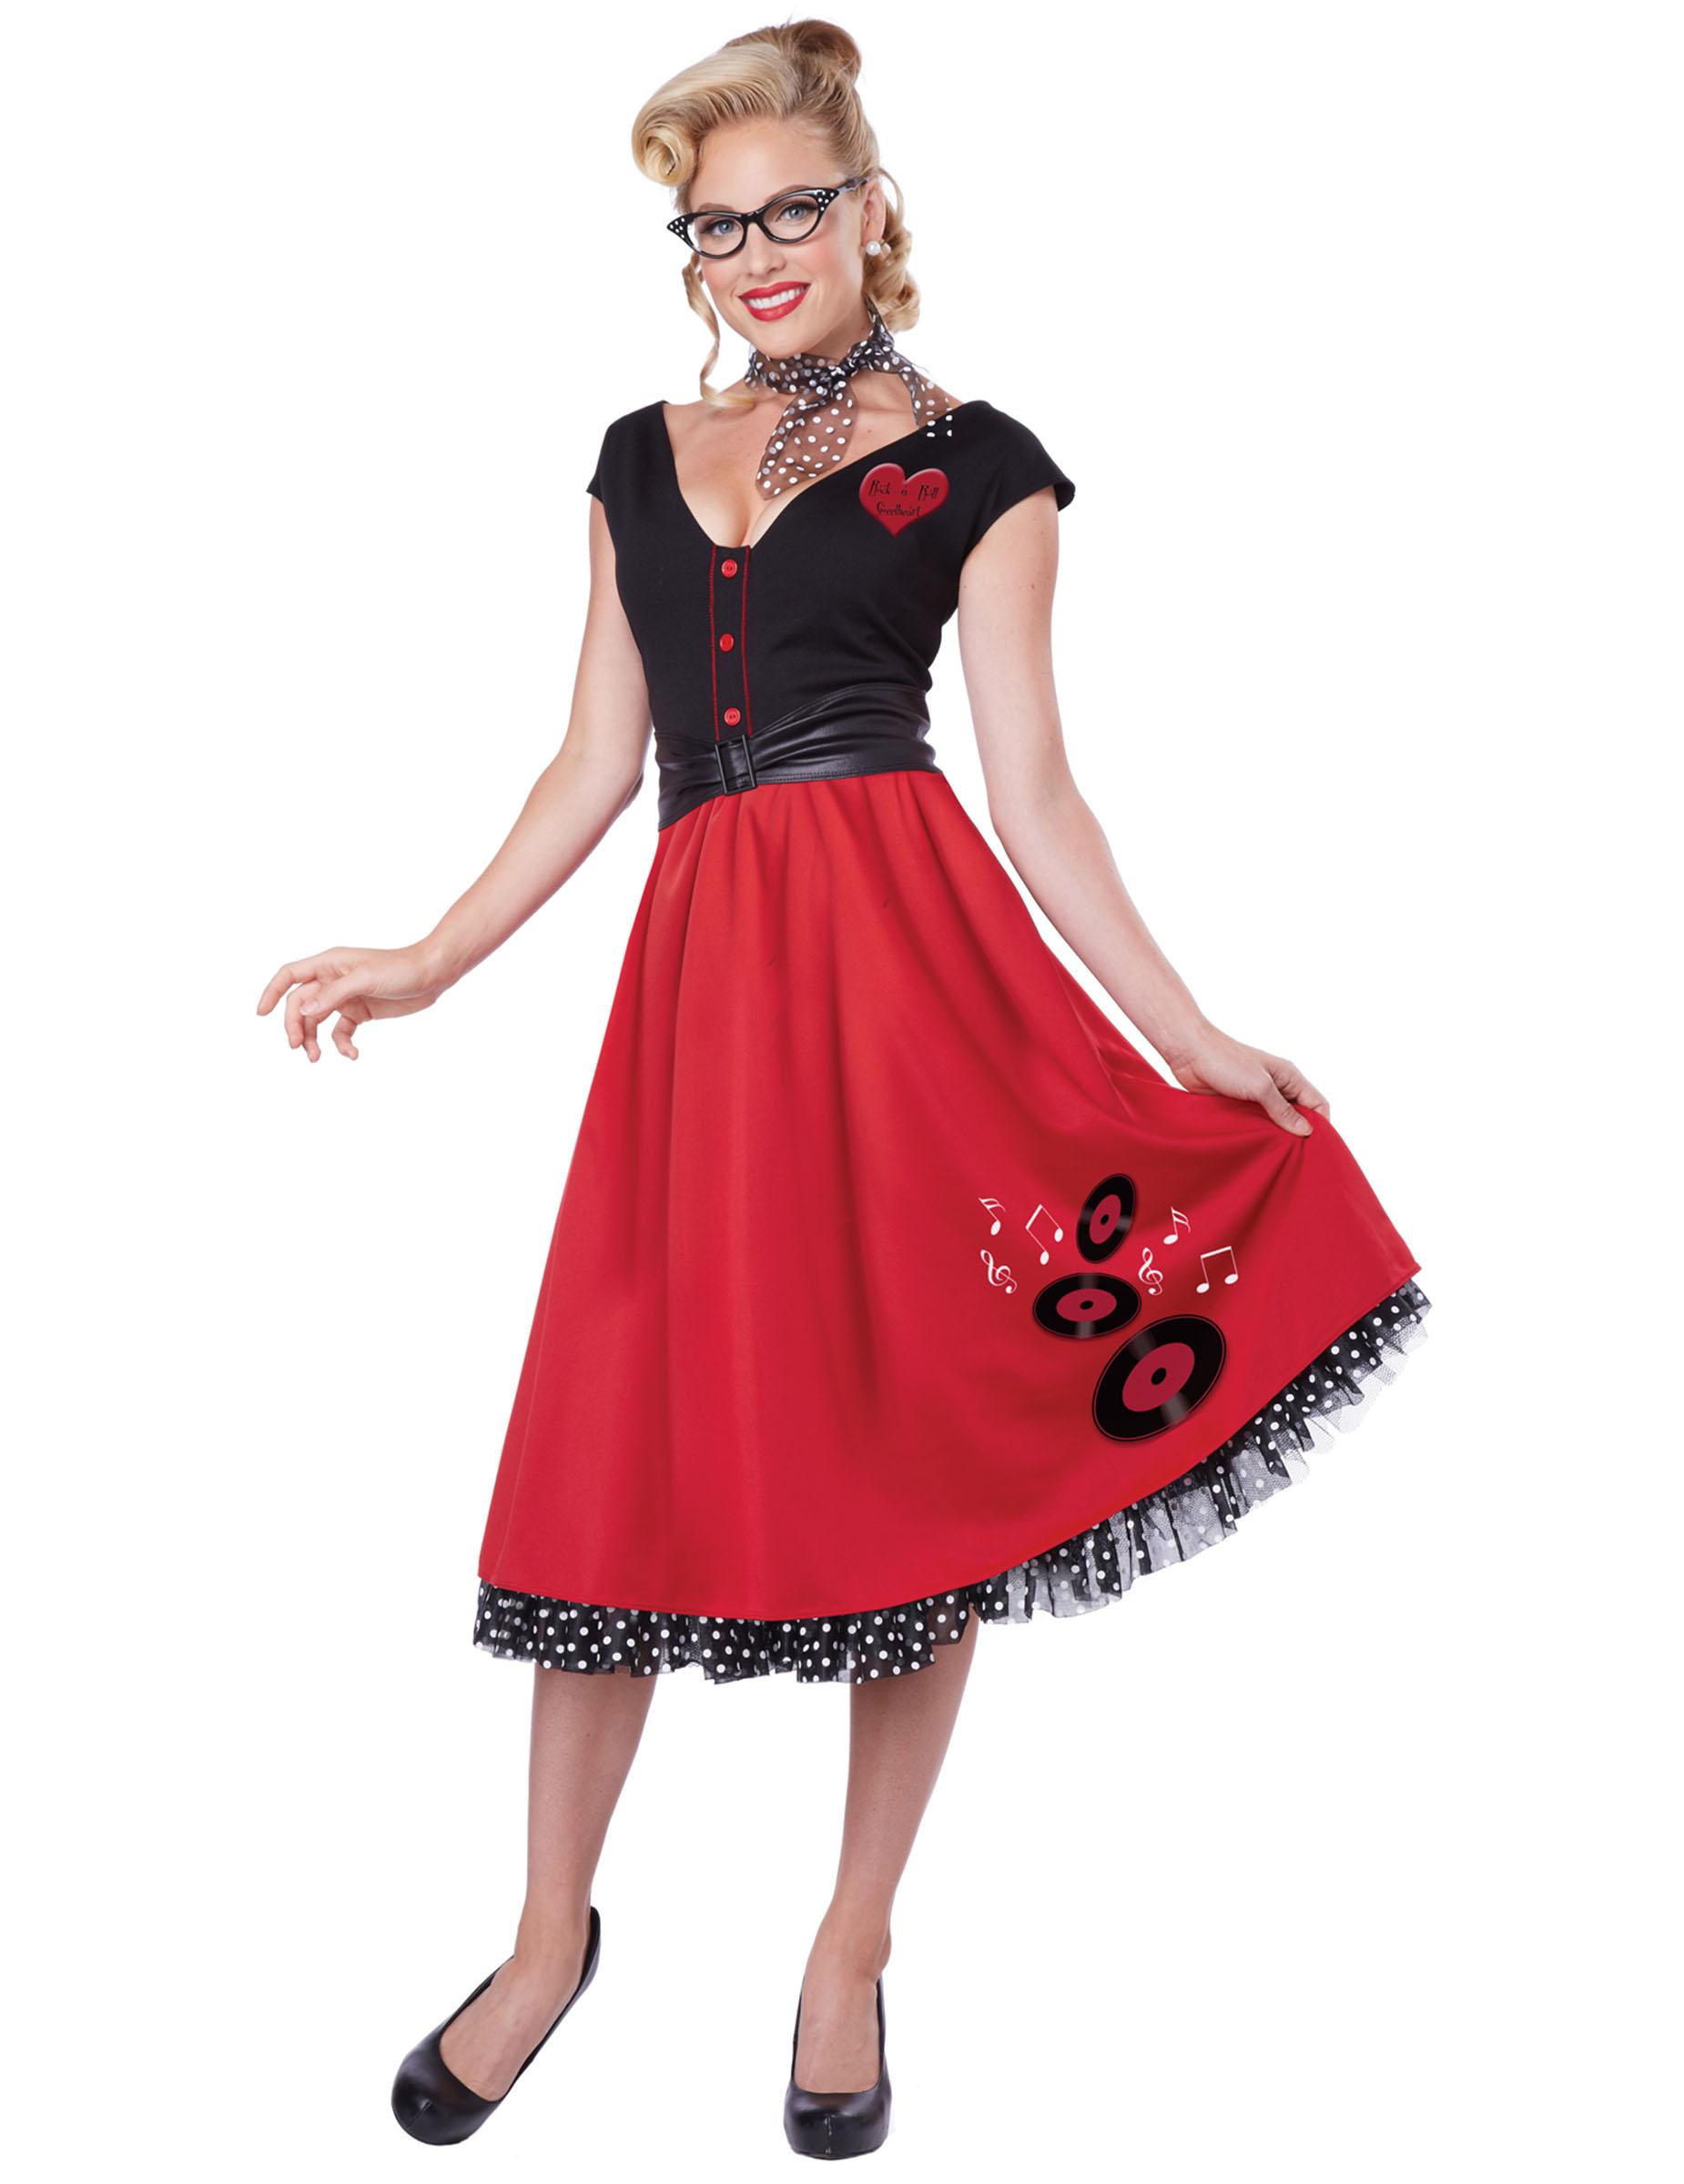 f0519ba02bba8c 50er Jahre Rockabilly Damenkostüm Petticoat rot-schwarz , günstige ...